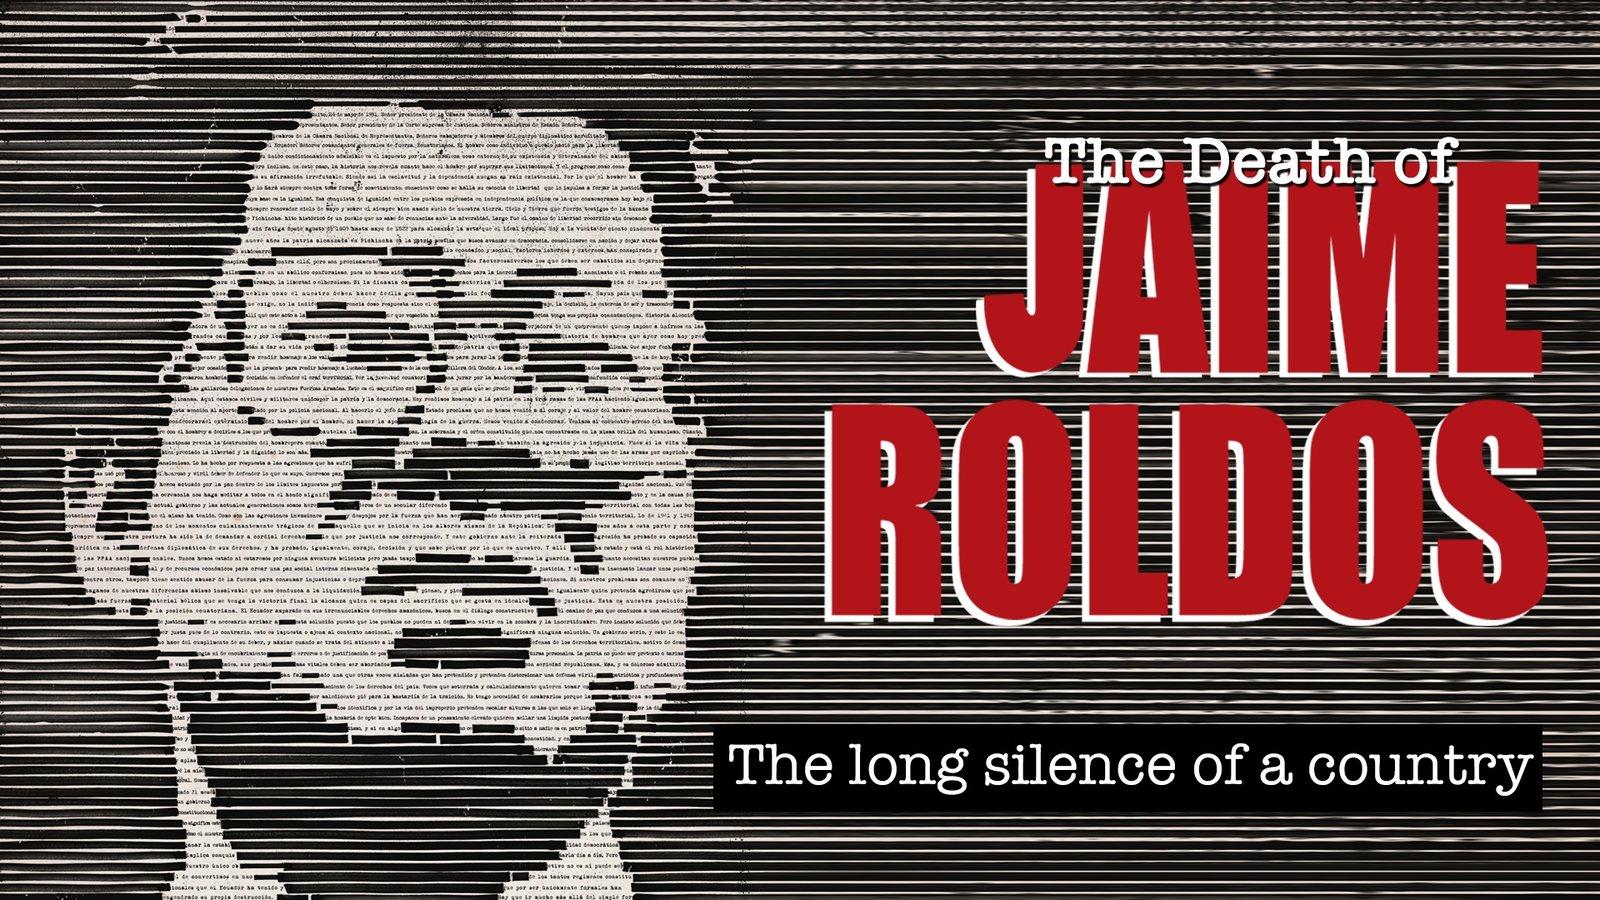 The Death of Jaime Roldós - Investigating the Suspicious Death of an Ecuadorian President